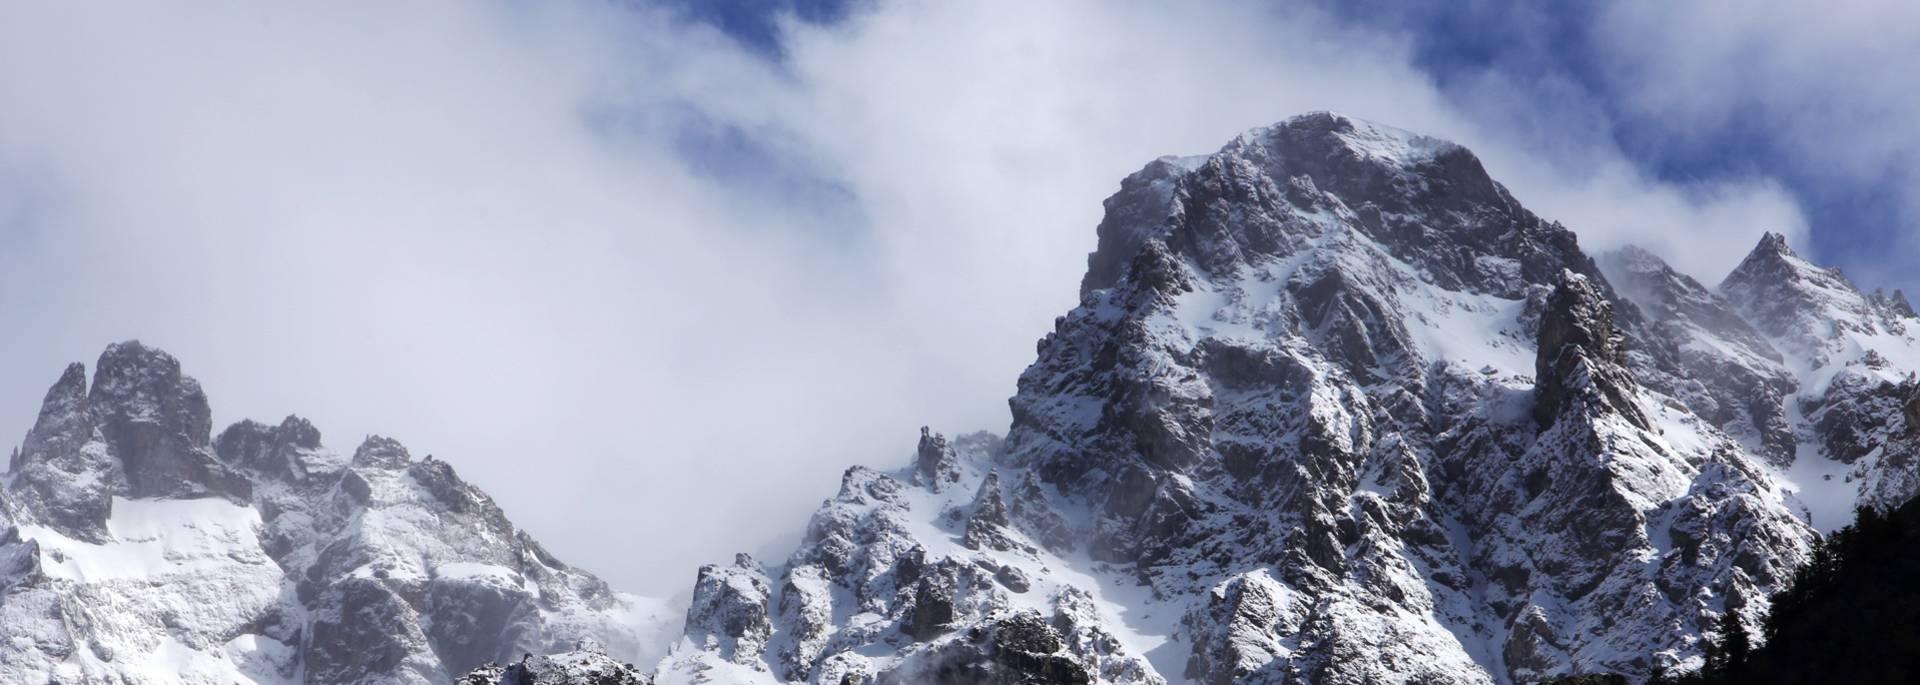 - glacier_noir_montagne_rando_ete_jannovakphotography-22.JPG